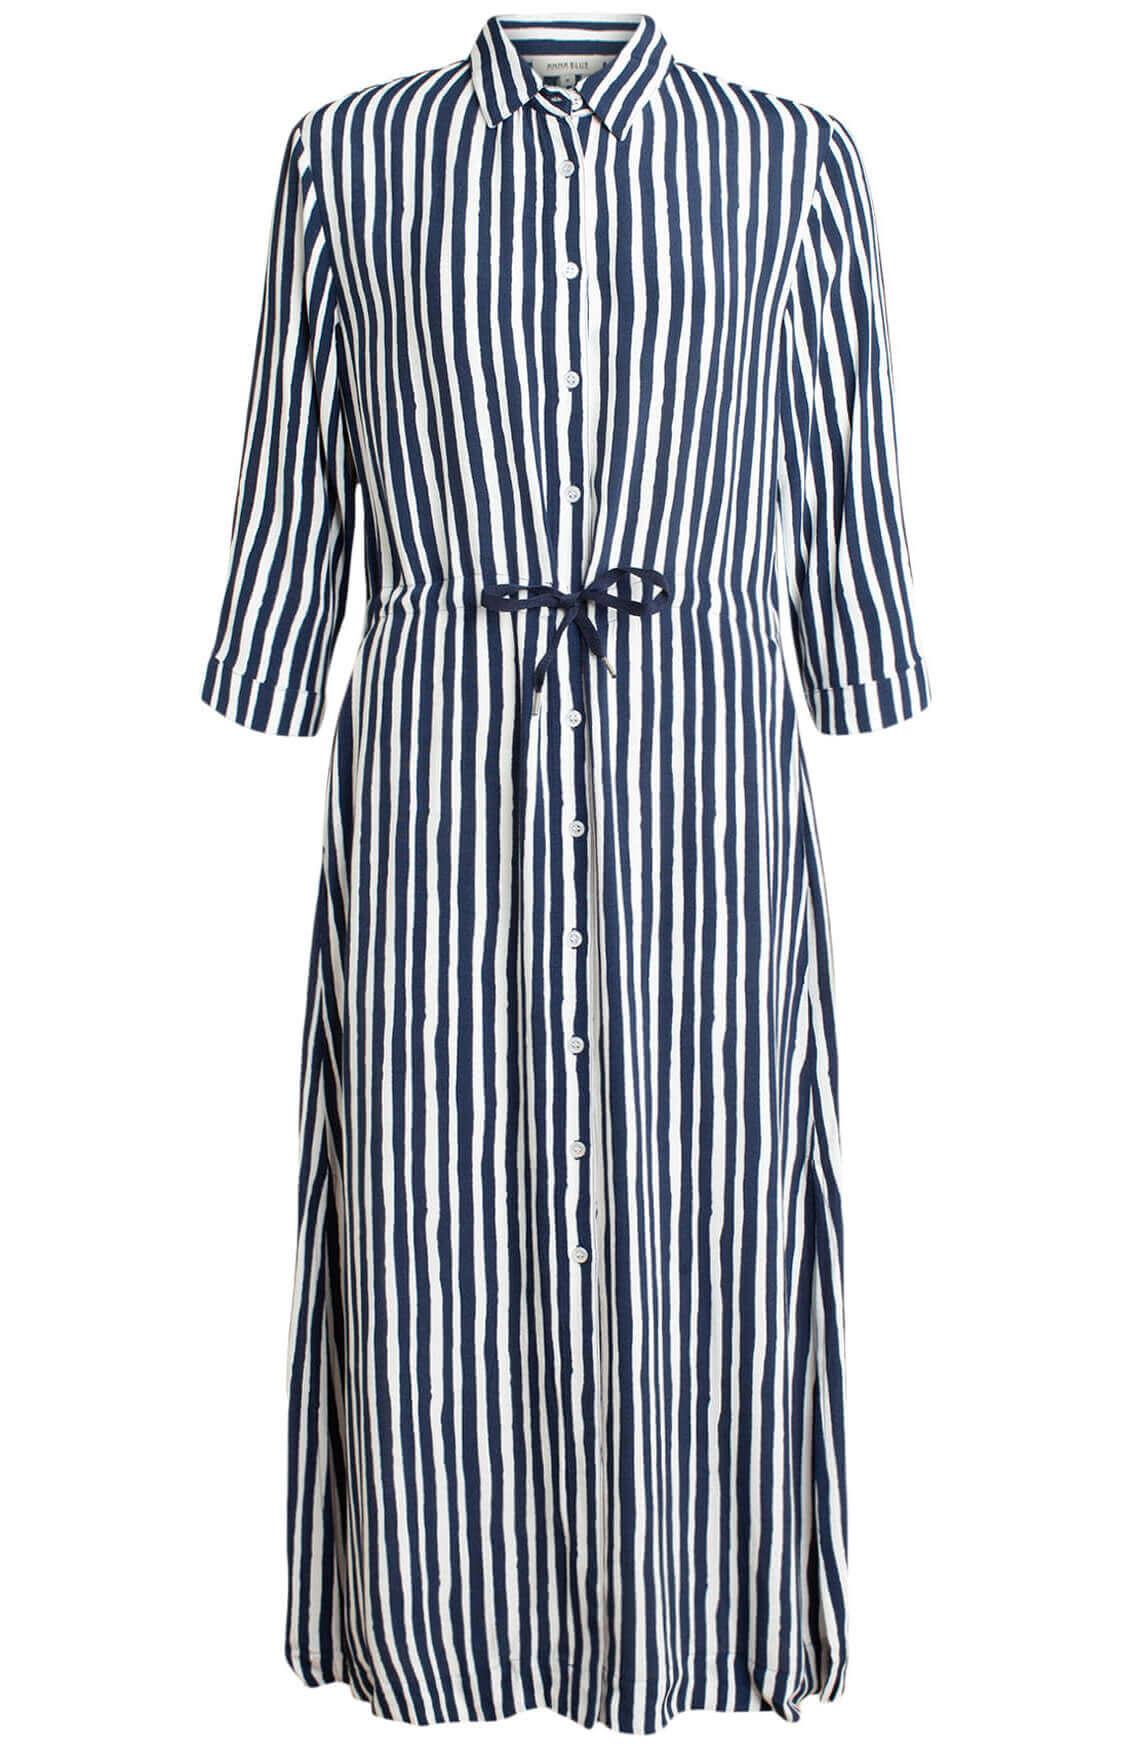 Anna Blue Dames Gestreepte jurk Blauw